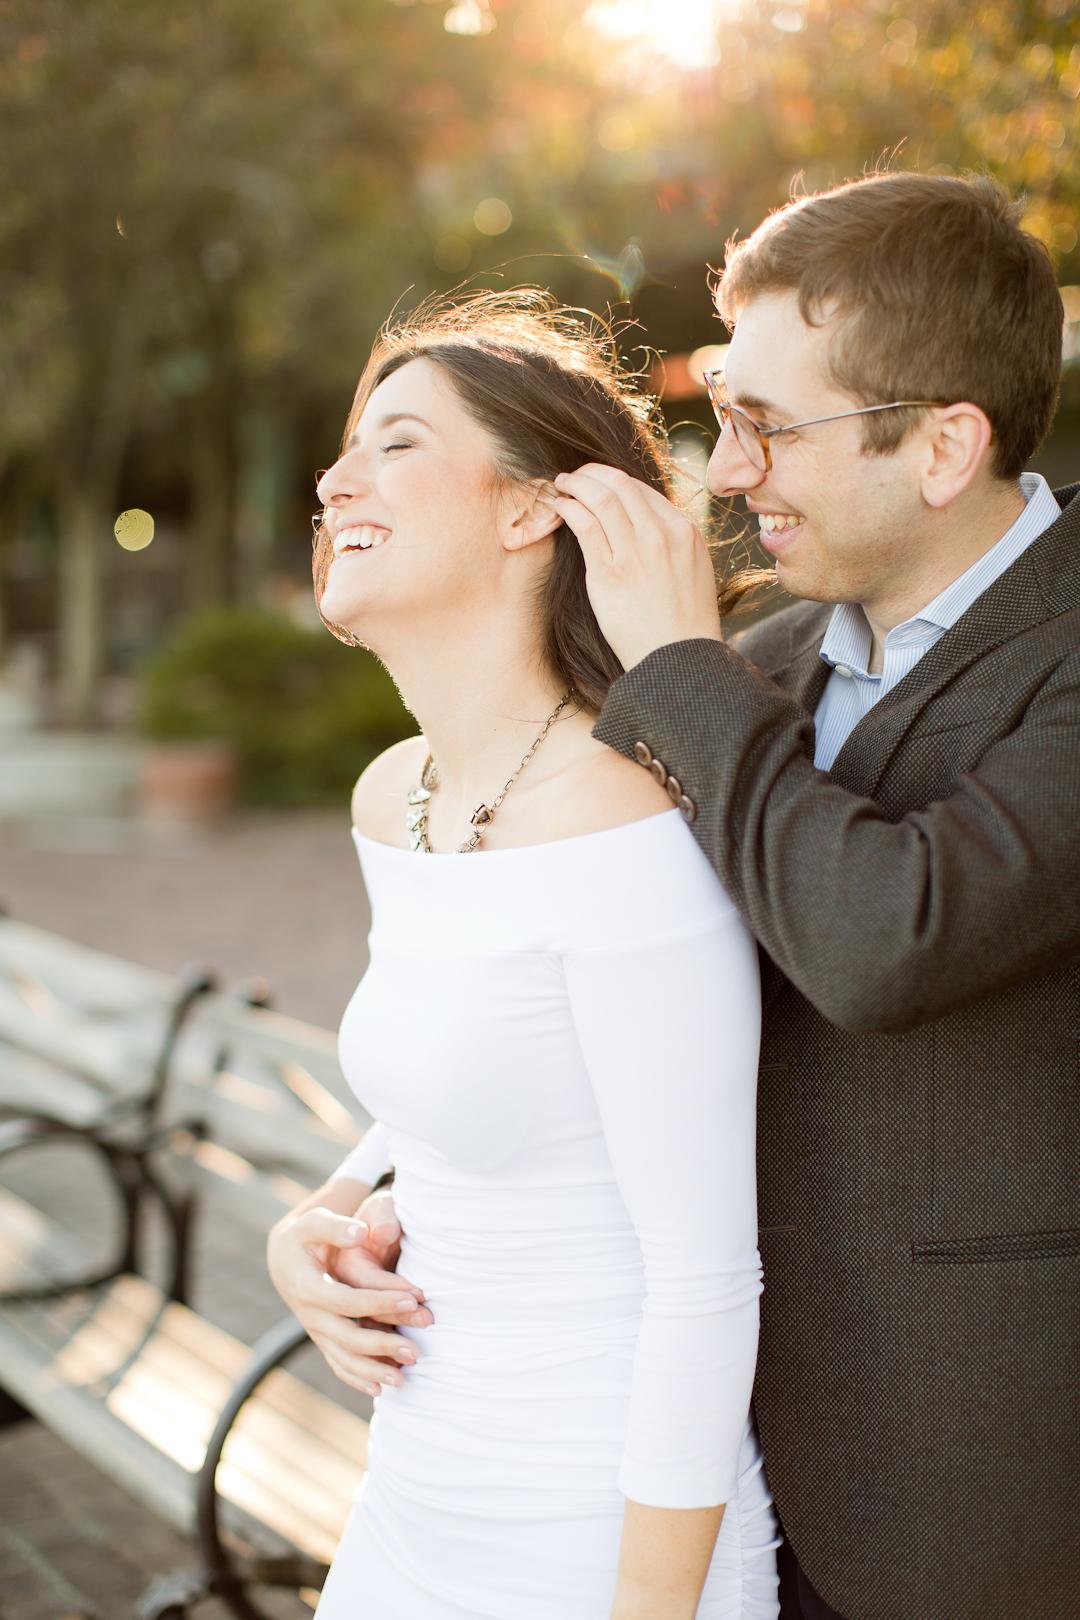 Melissa Kruse Photography - Christina & Alex Kips Bay Engagement Photos-71.jpg